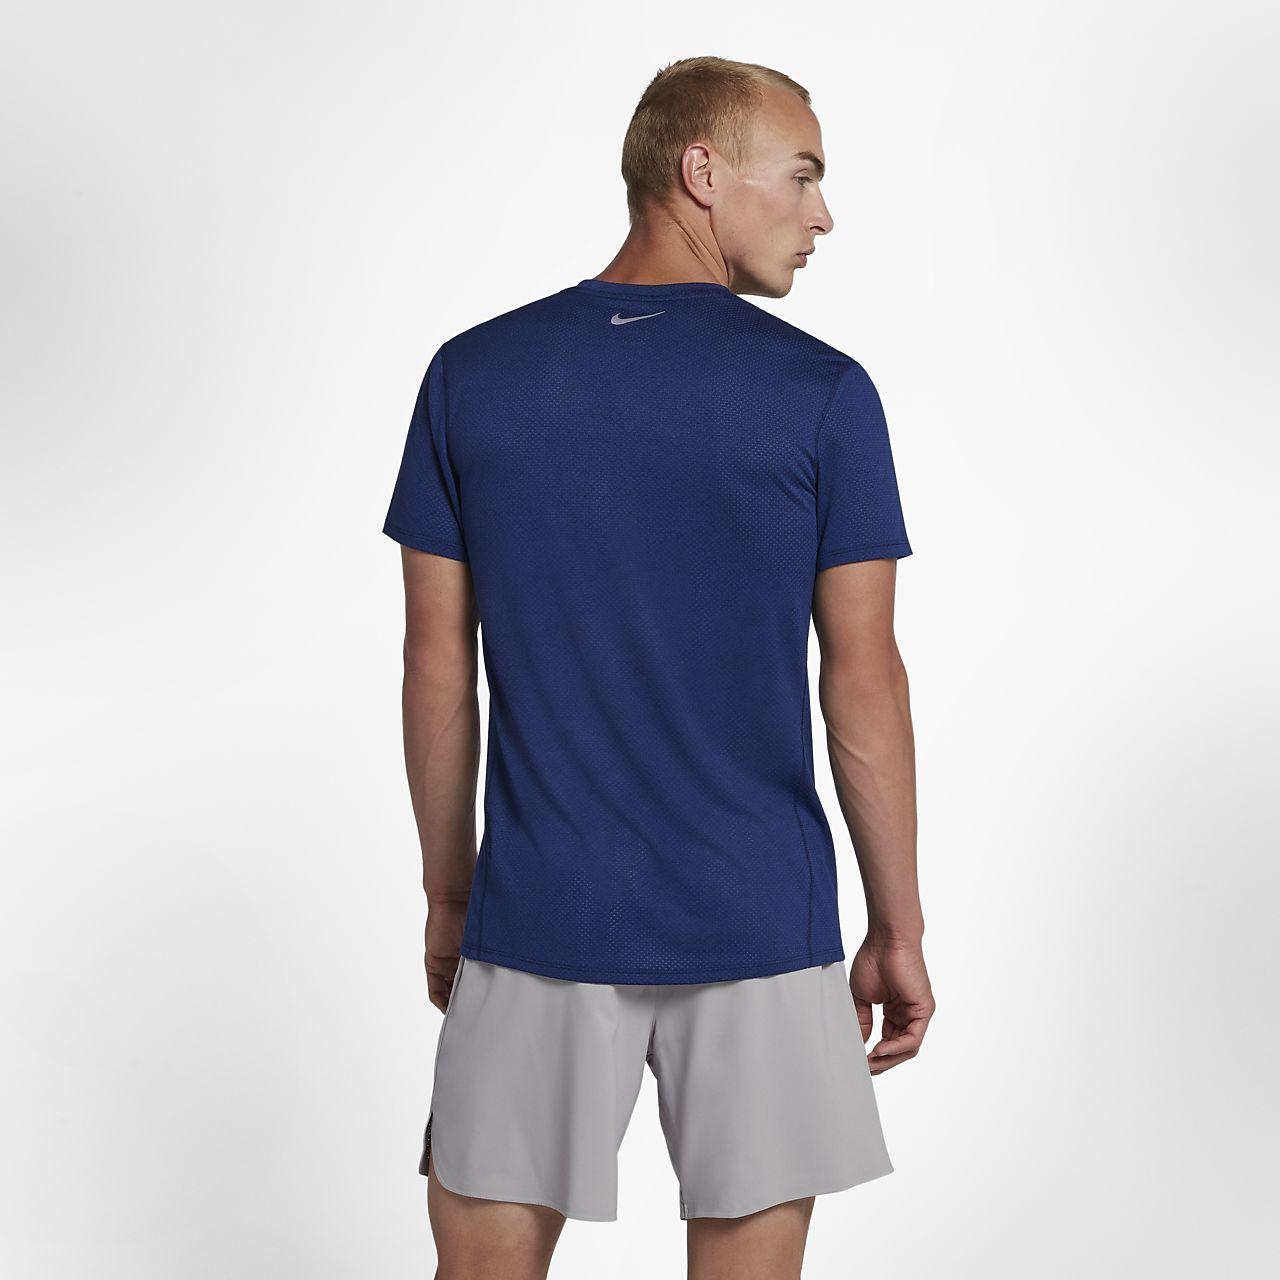 brand new 637d3 65c28 ... Nike Dri-FIT Miler Cool Men s Short-Sleeve Running Top